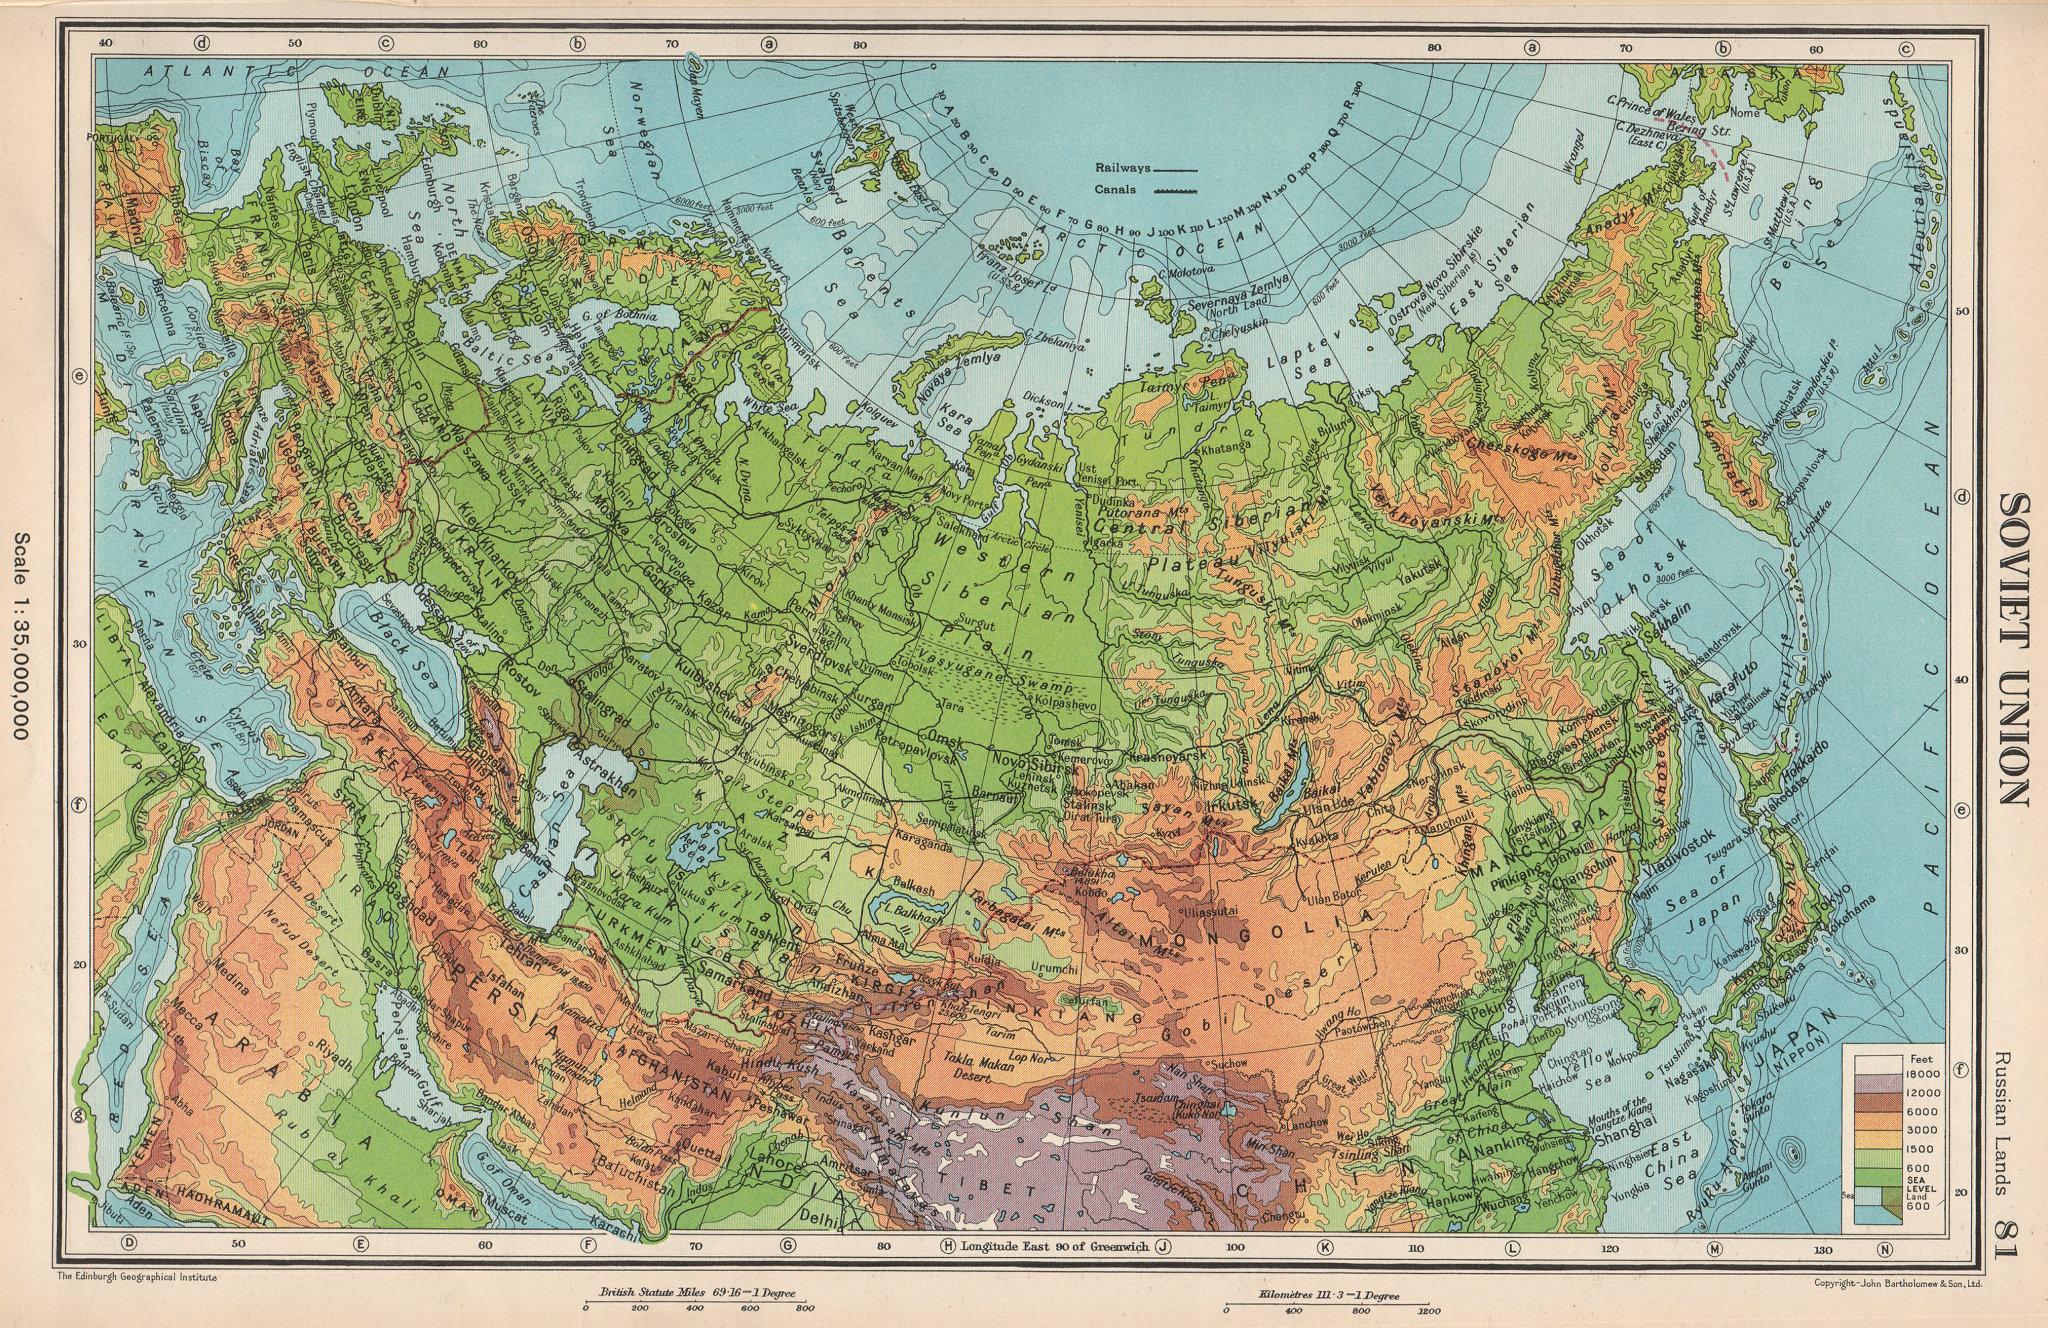 Associate Product SOVIET UNION PHYSICAL. USSR. Railways. BARTHOLOMEW 1952 old vintage map chart